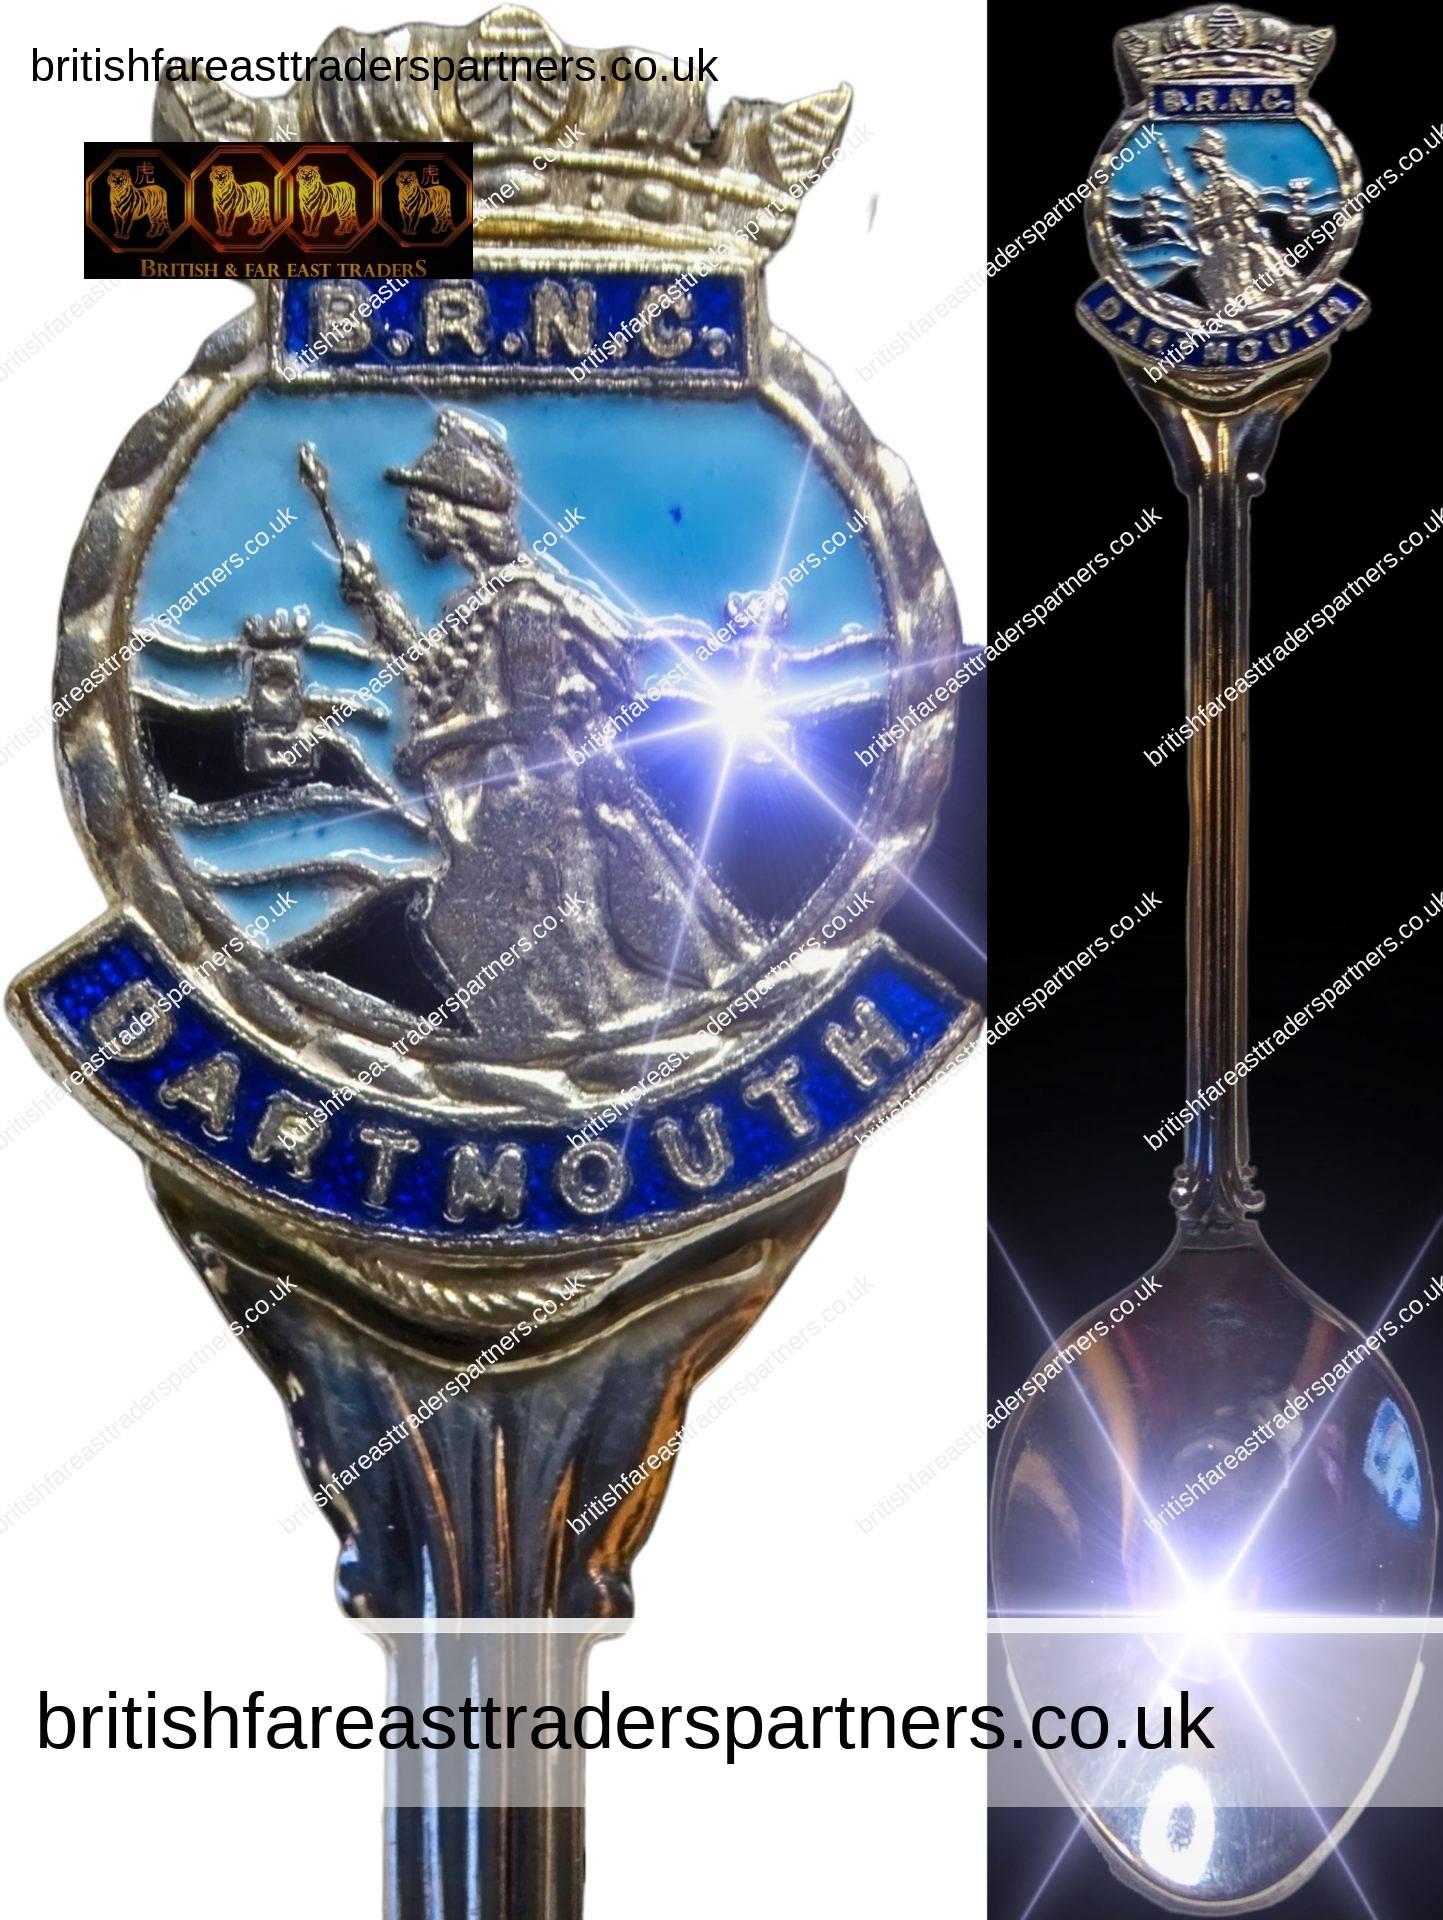 "BRNC DARTMOUTH ""BRITANNIA ROYAL NAVAL COLLEGE"" SOUVENIR SPOON W.A.W.P GREAT BRITAIN SILVER PLATED COLLECTABLES | MEMORABILIA | SOUVENIRS"